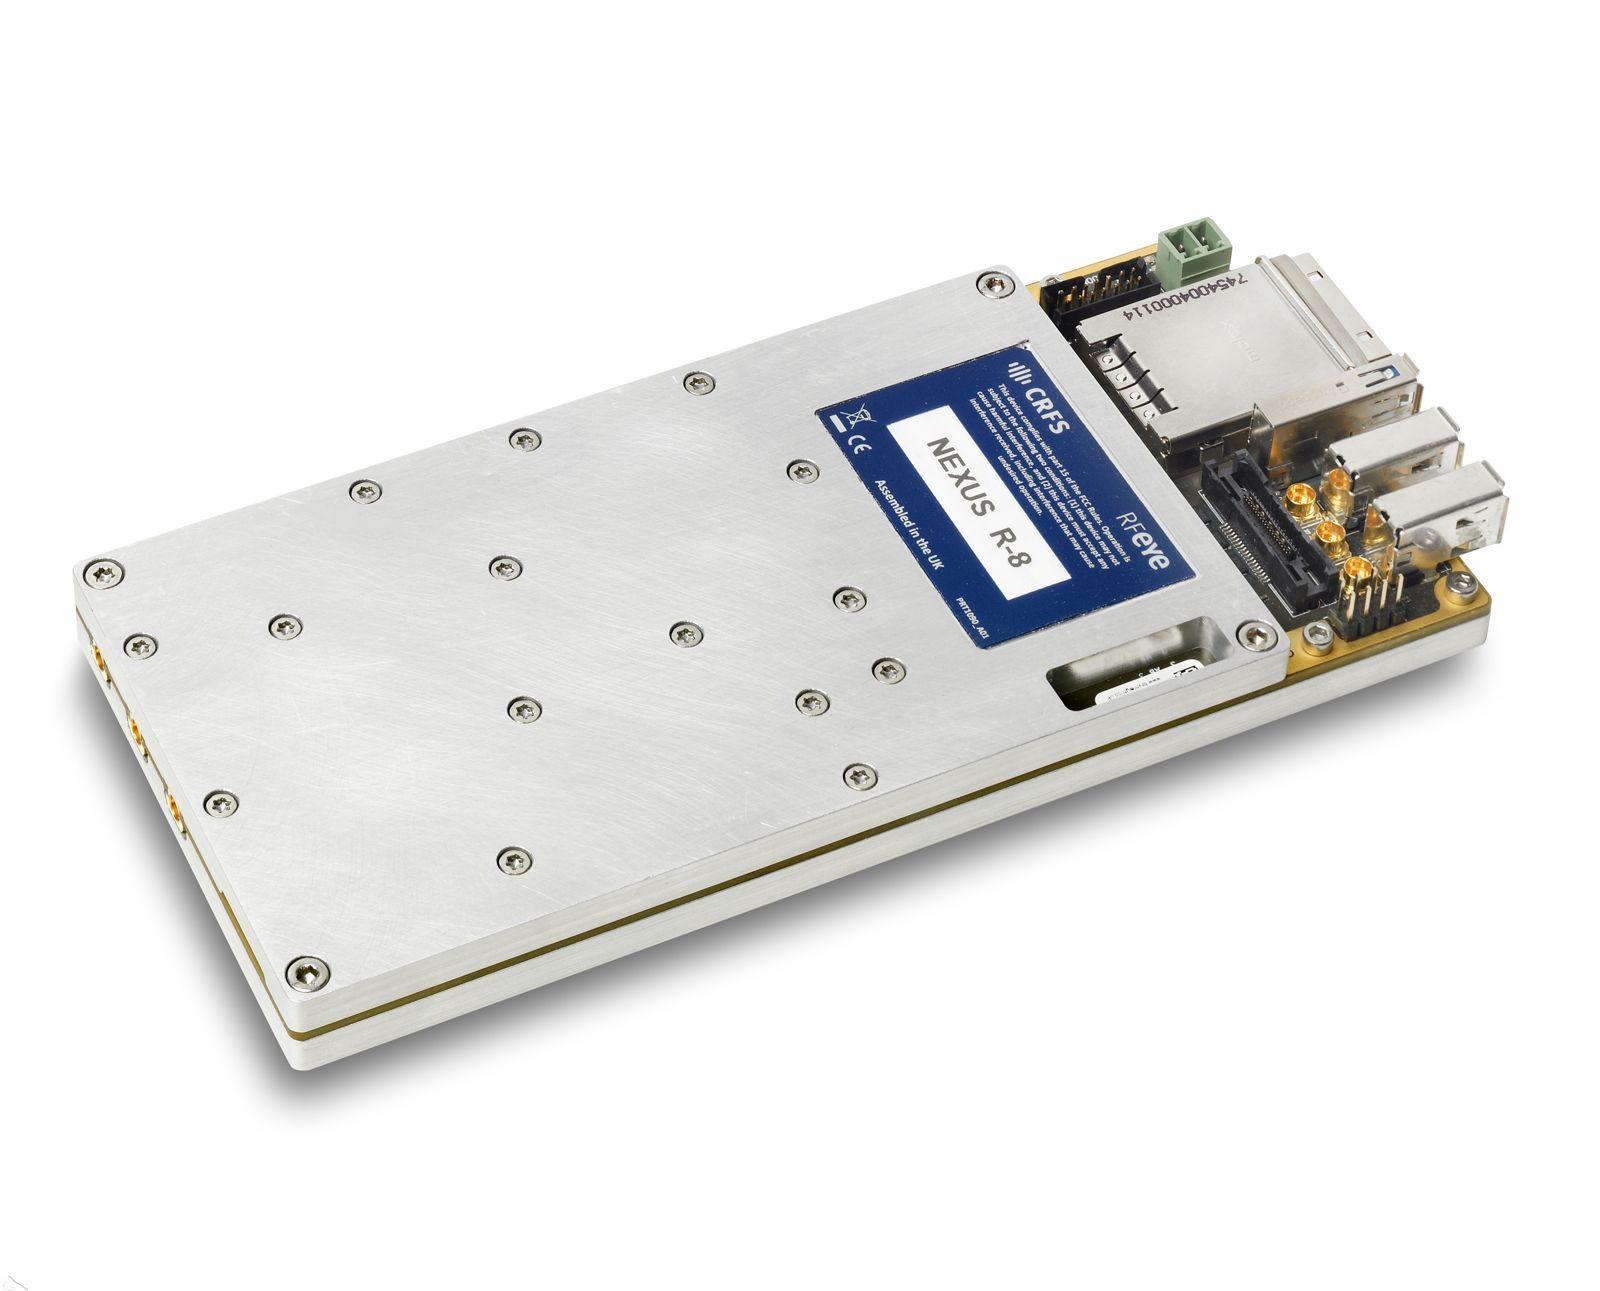 Nexus R-8 Wideband Receiver